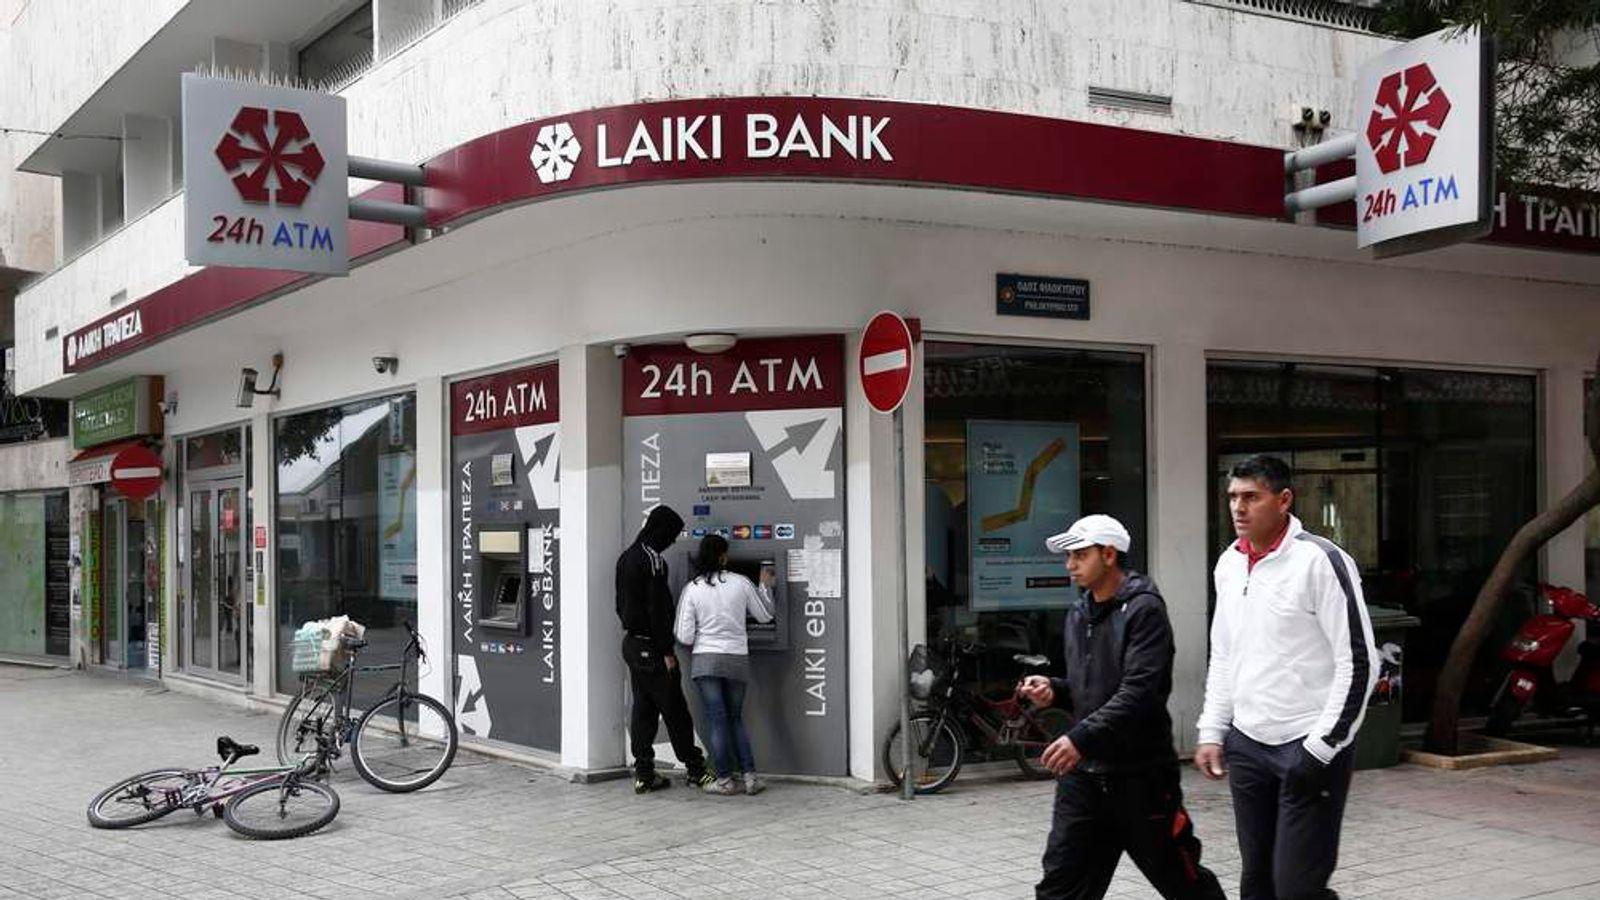 Laiki bank in Nicosia